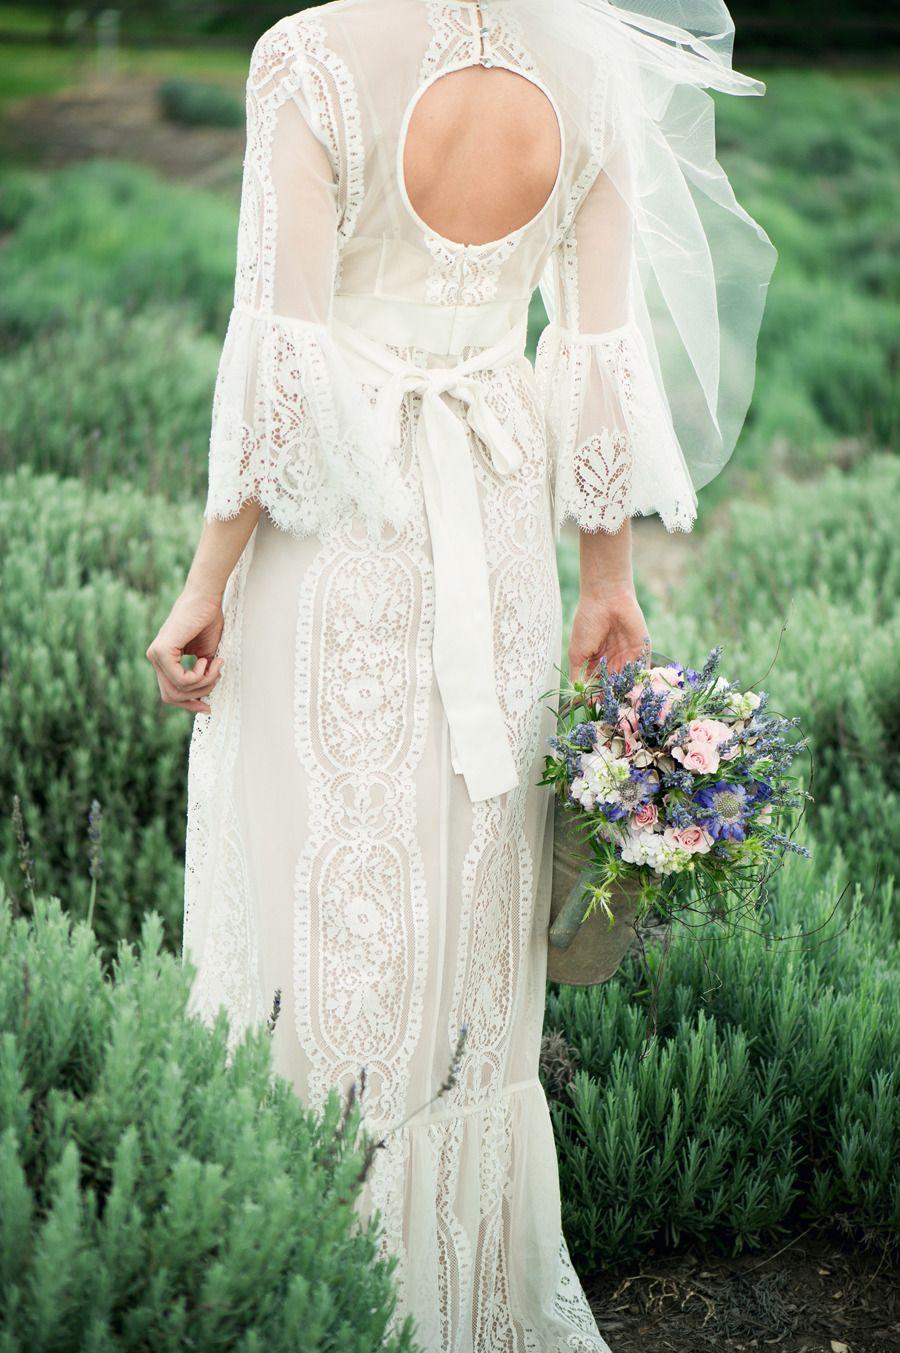 Photography: Gary Guy Photographer - garyguyphotographer.com    Read More: http://www.stylemepretty.com/texas-weddings/bellville/2013/10/29/lavender-farm-inspiration-from-adorne-artistry-gary-guy-photographer/